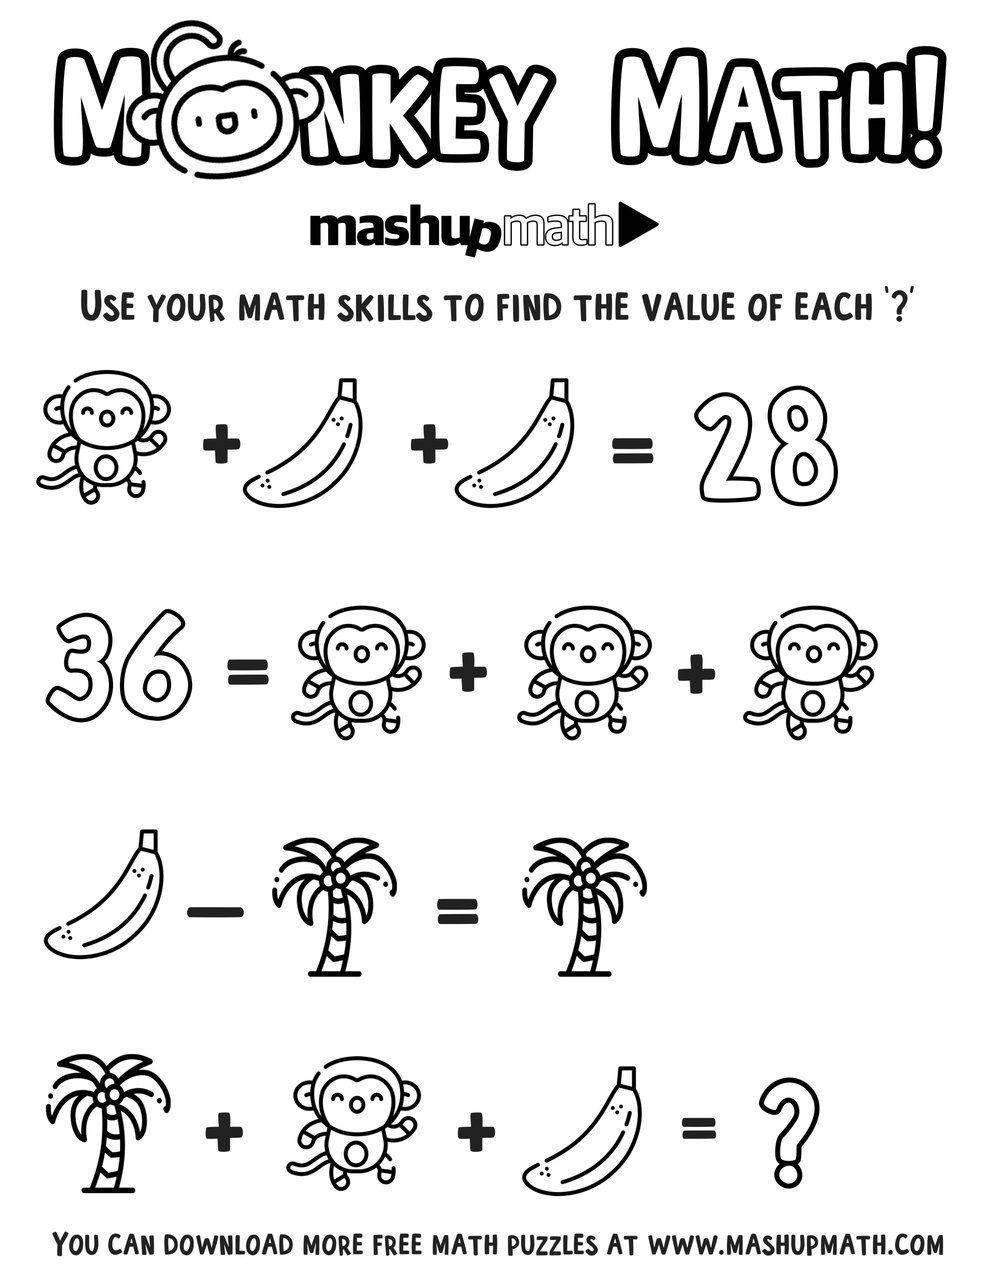 Free Math Coloring Worksheets for 23th and 23th Grade — Mashup Math